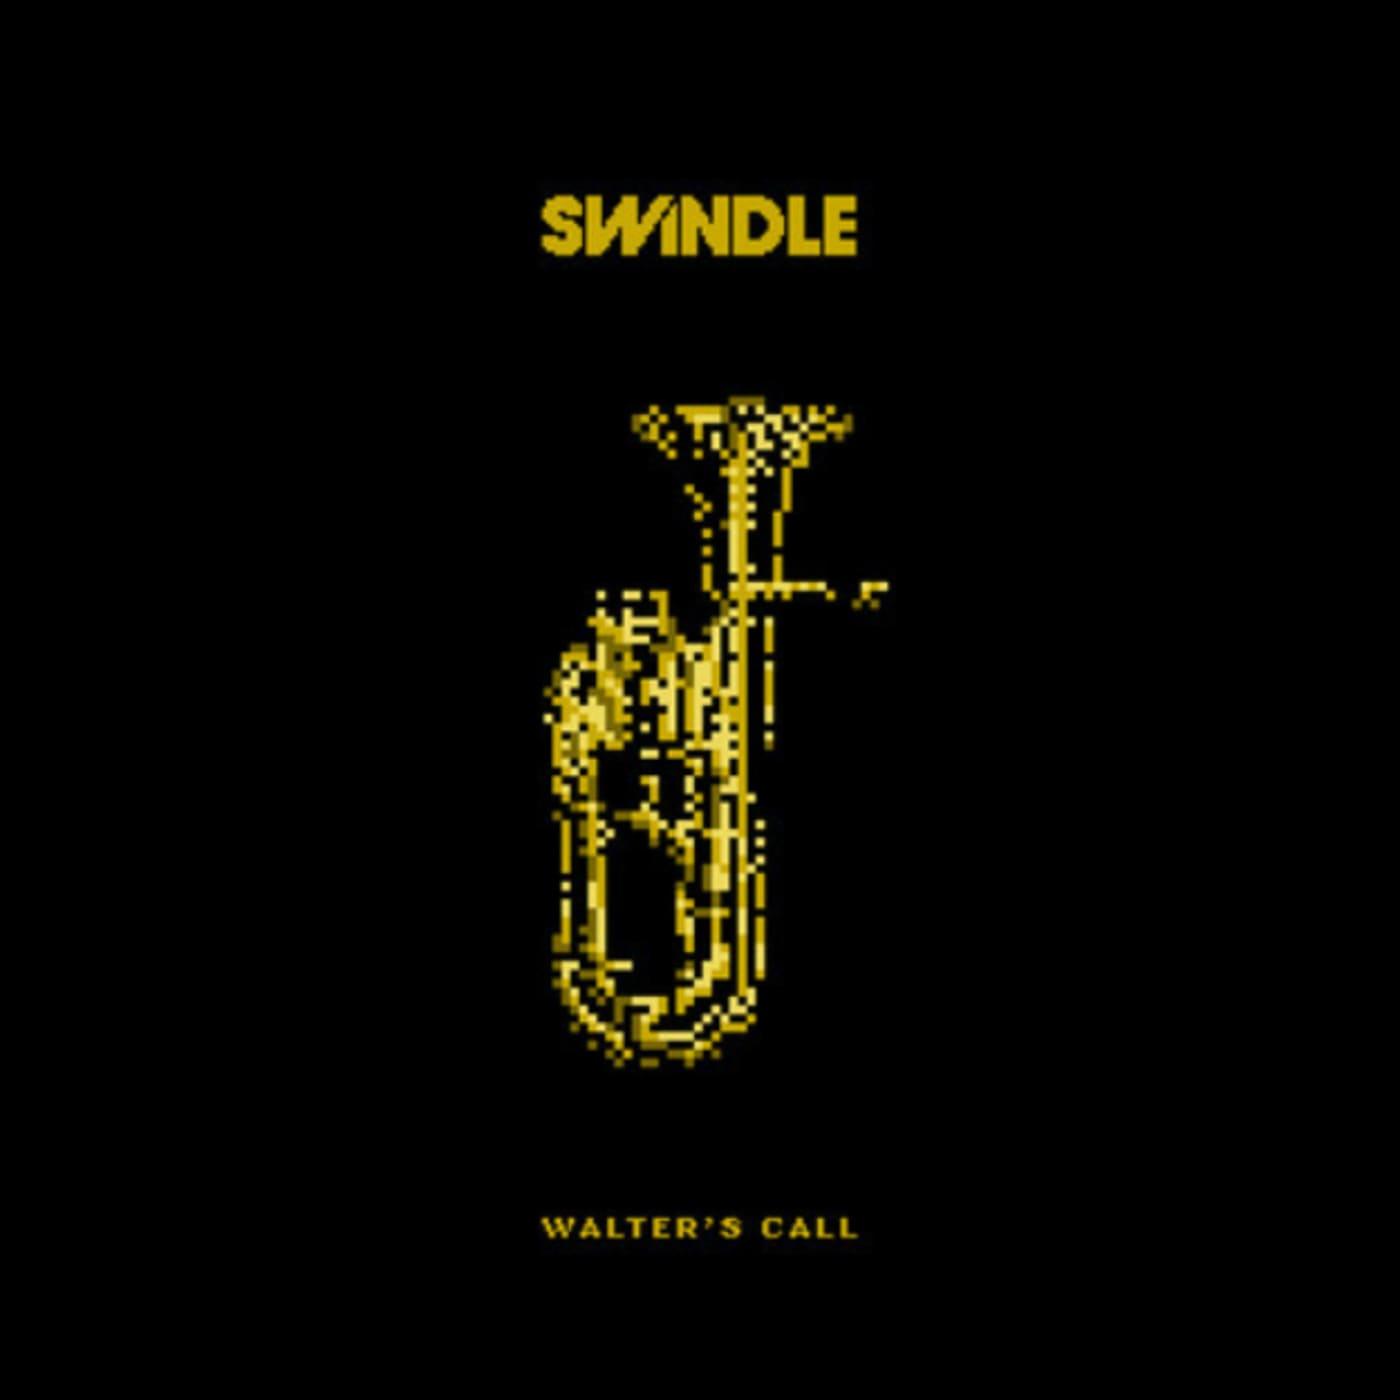 swindle walters call